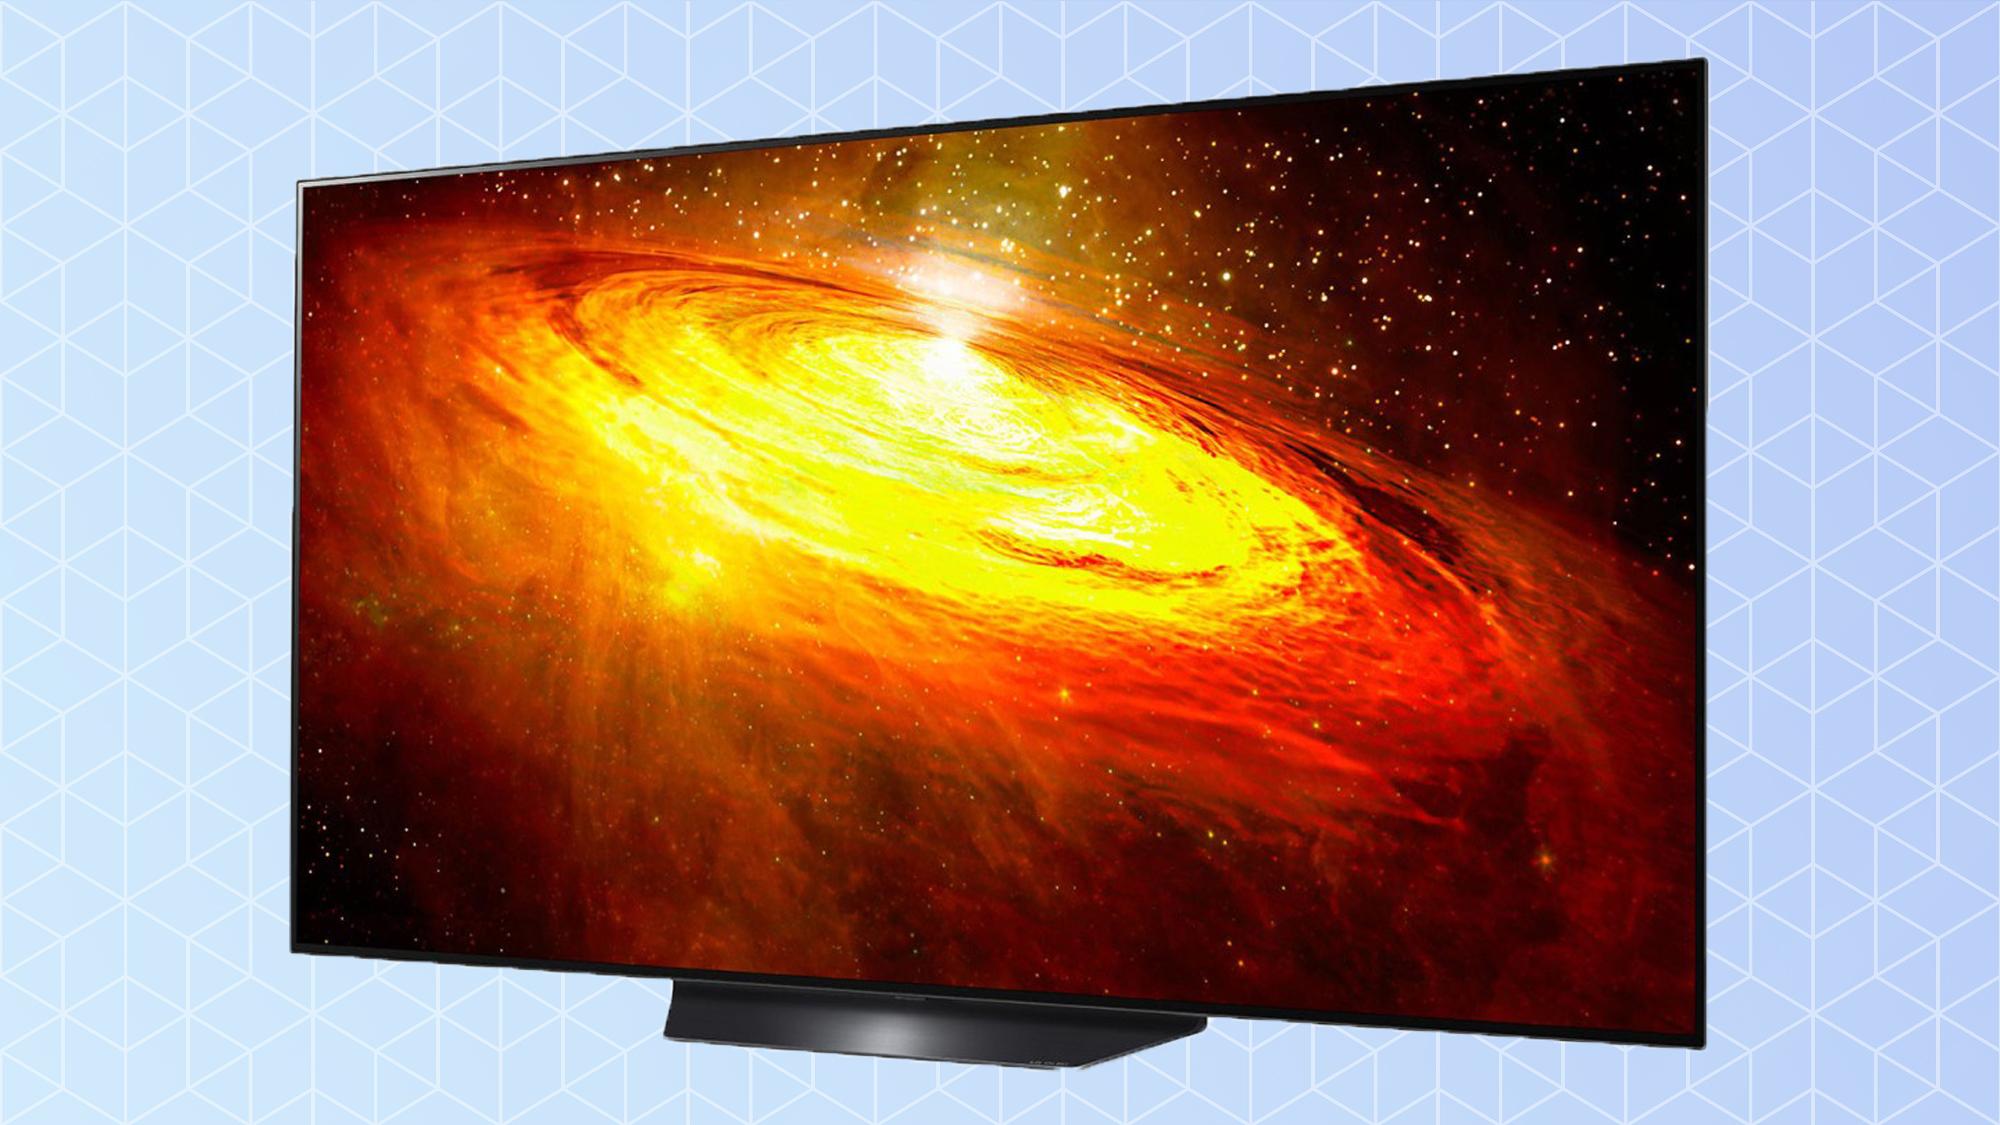 Best OLED TVs: LG BX OLED 4K TV review